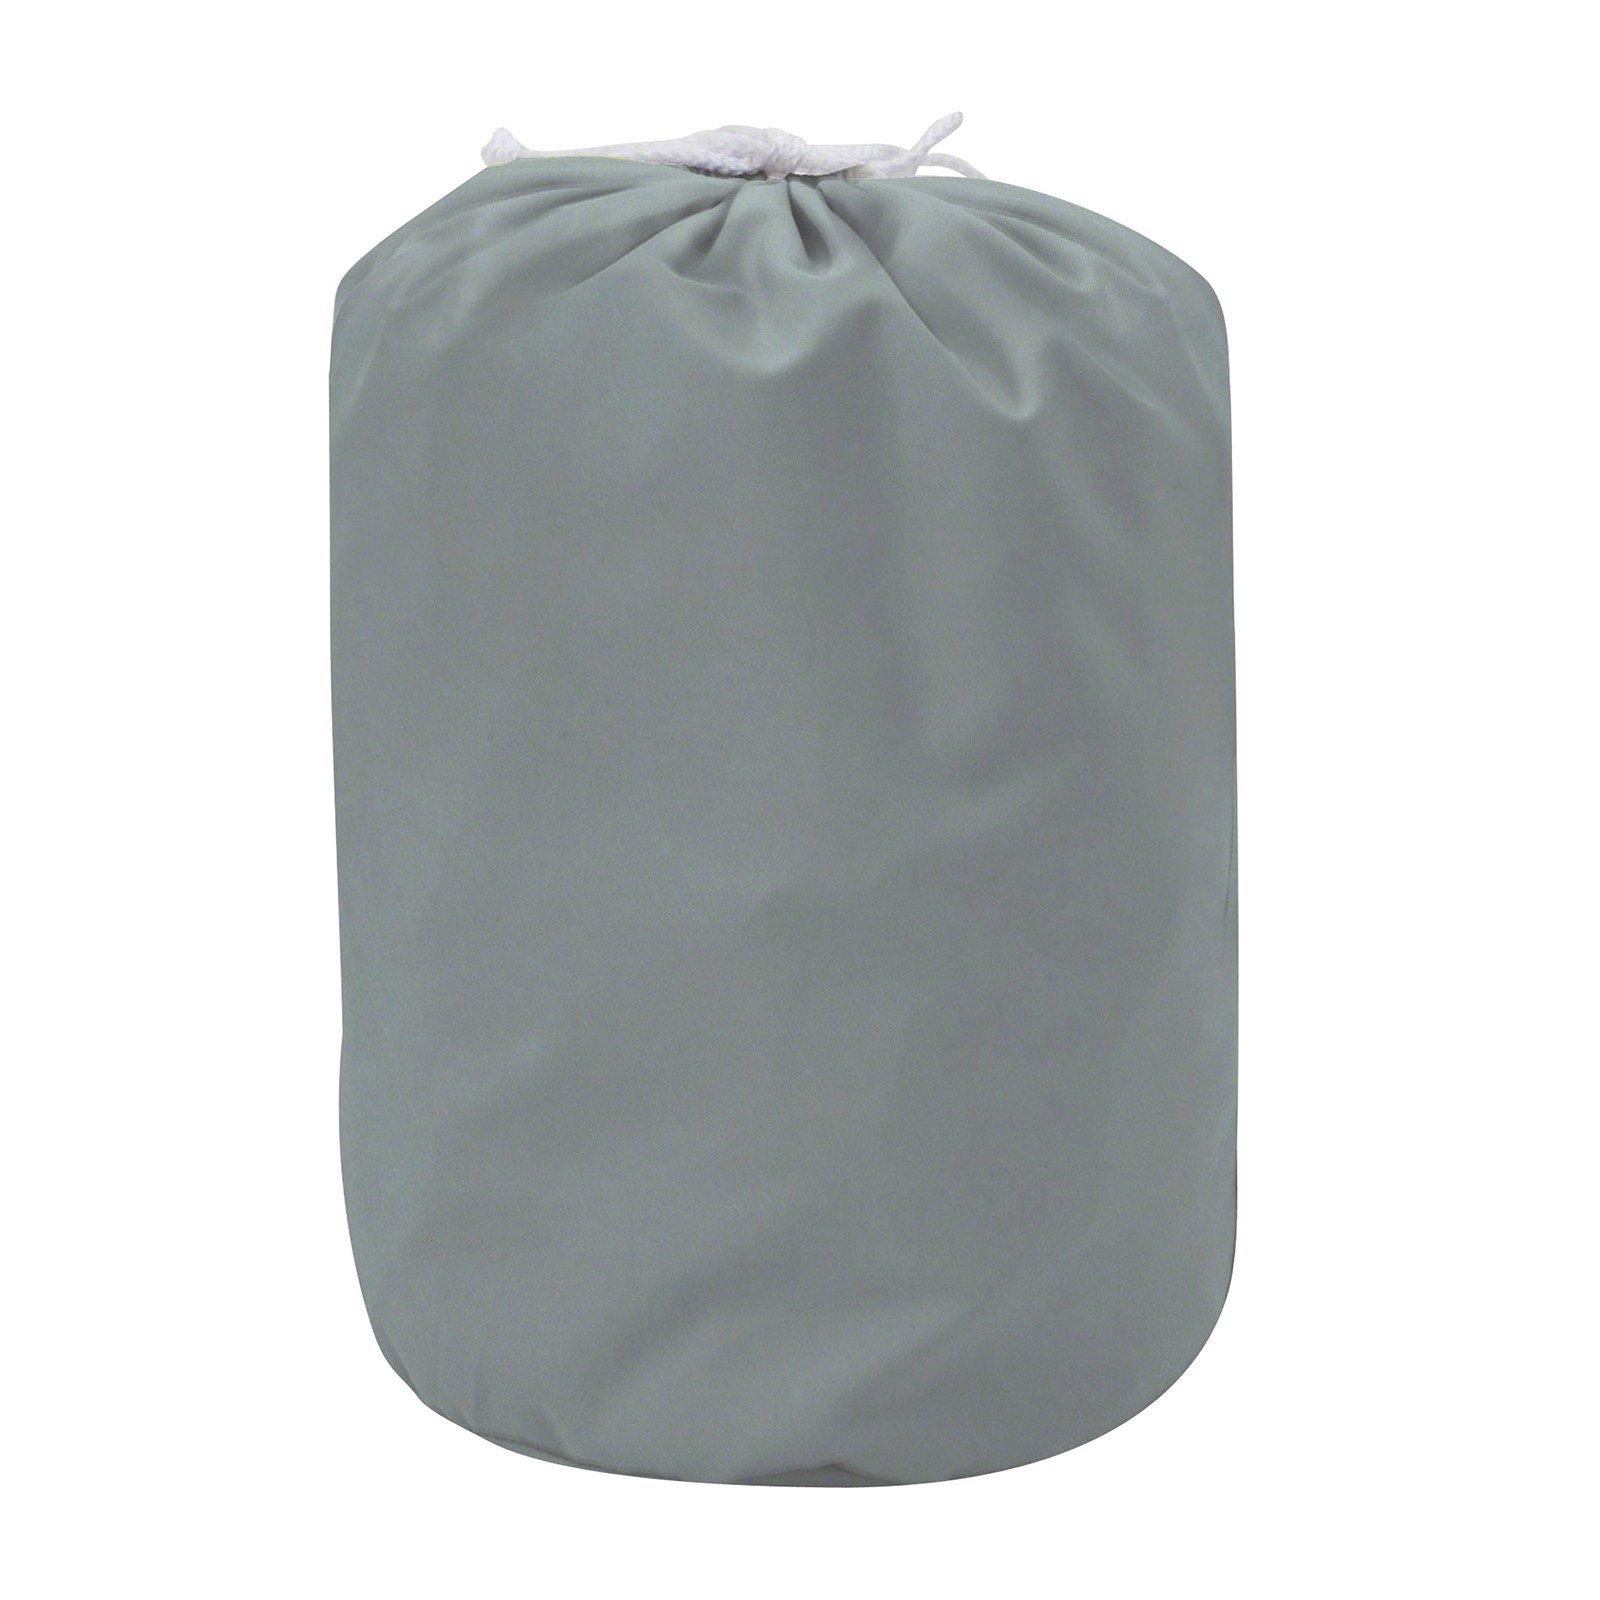 SavvyCraft Waterproof Pop Up Camper Folding Camping Trailer Storage Cover fits 14'-16'L by SavvyCraft